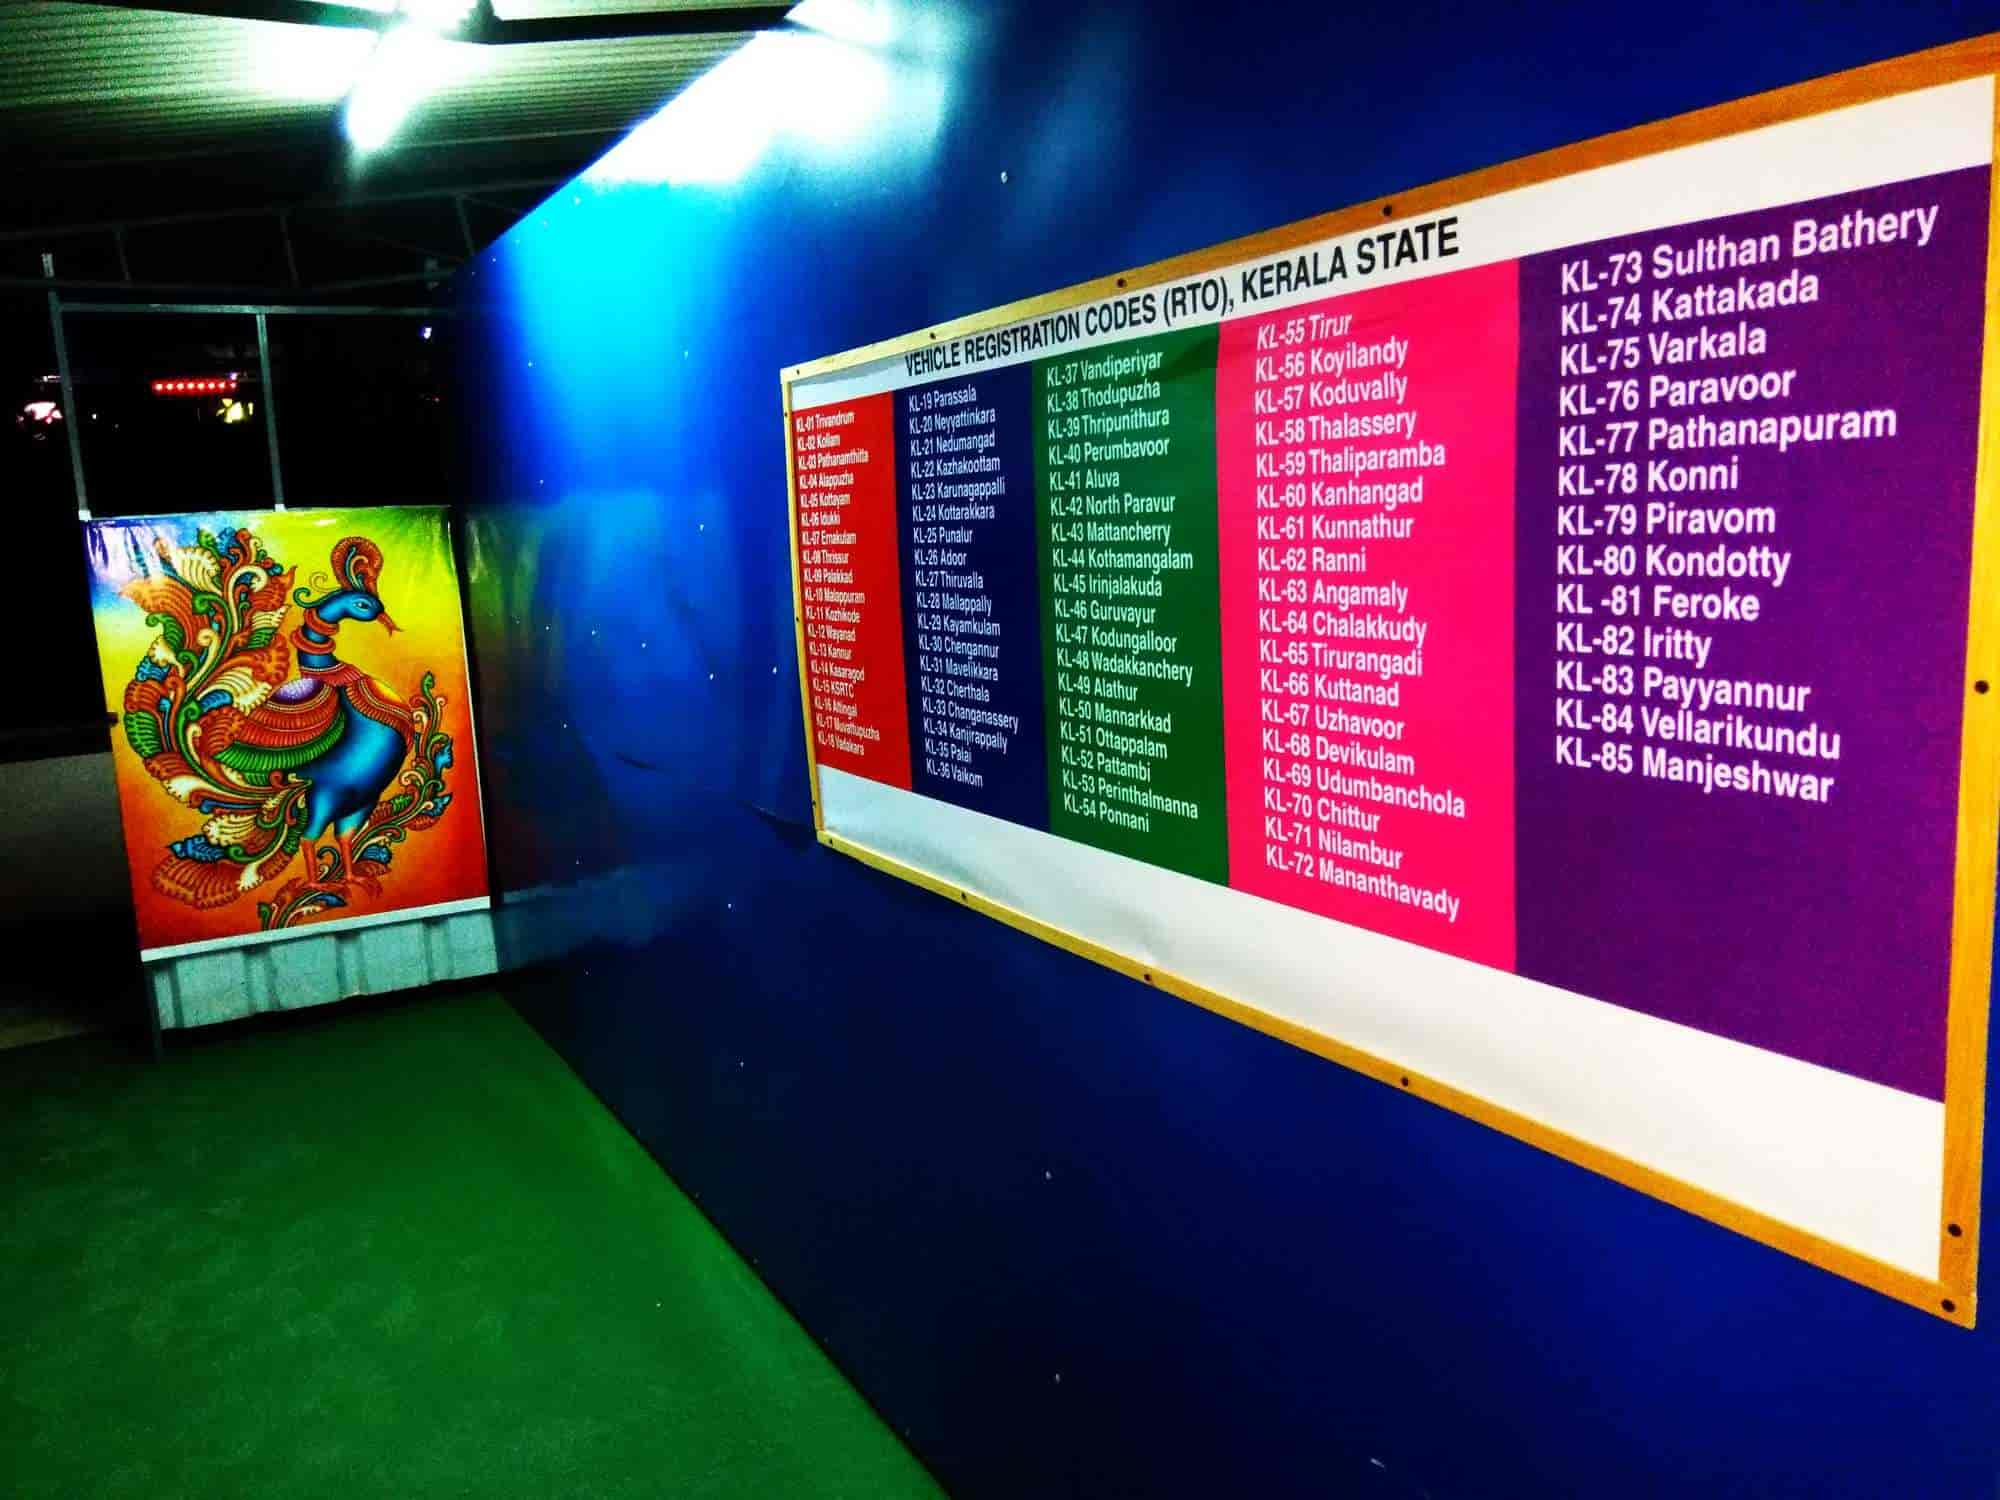 SN Driving School, Thammanam - Motor Training Schools in